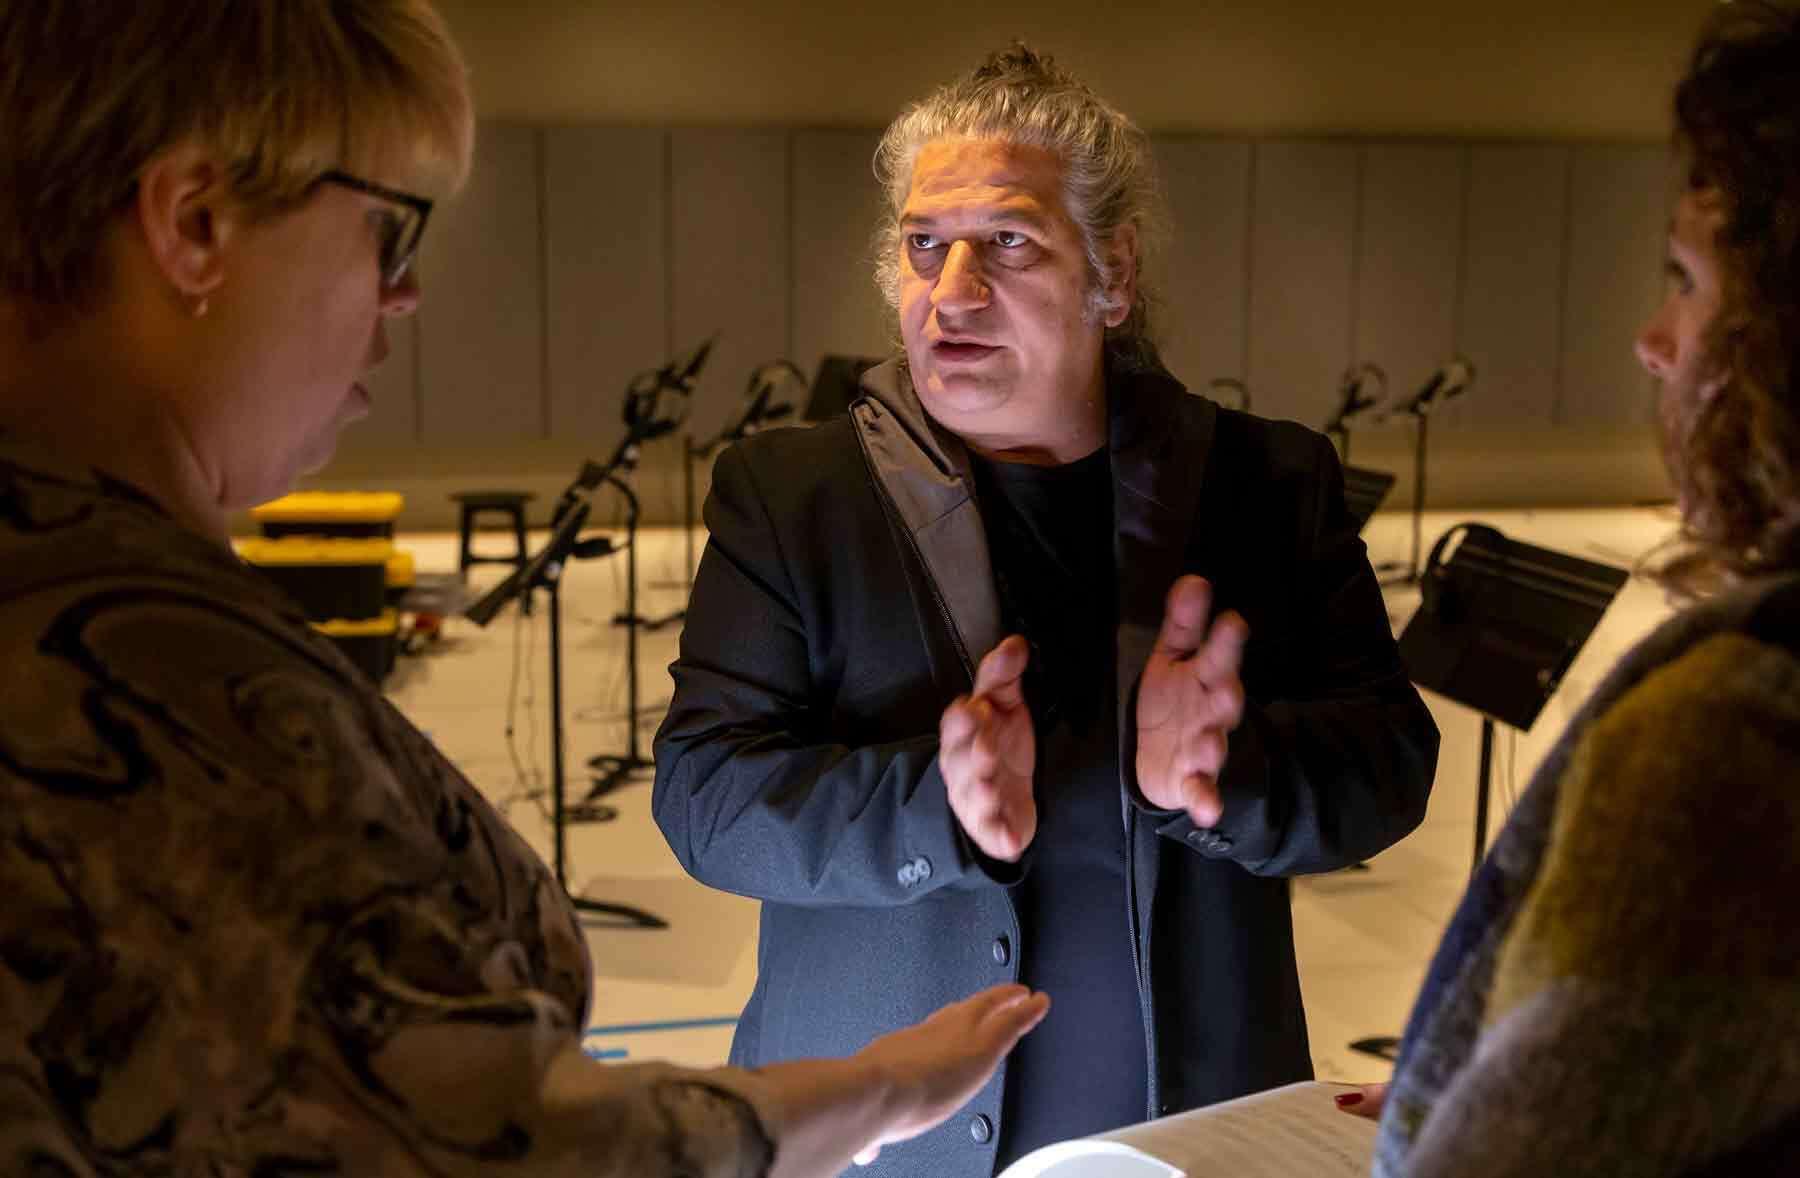 Carlos Garaicoa working with PEM staff on install of Partitura. Photo by Kathy Tarantola/PEM.